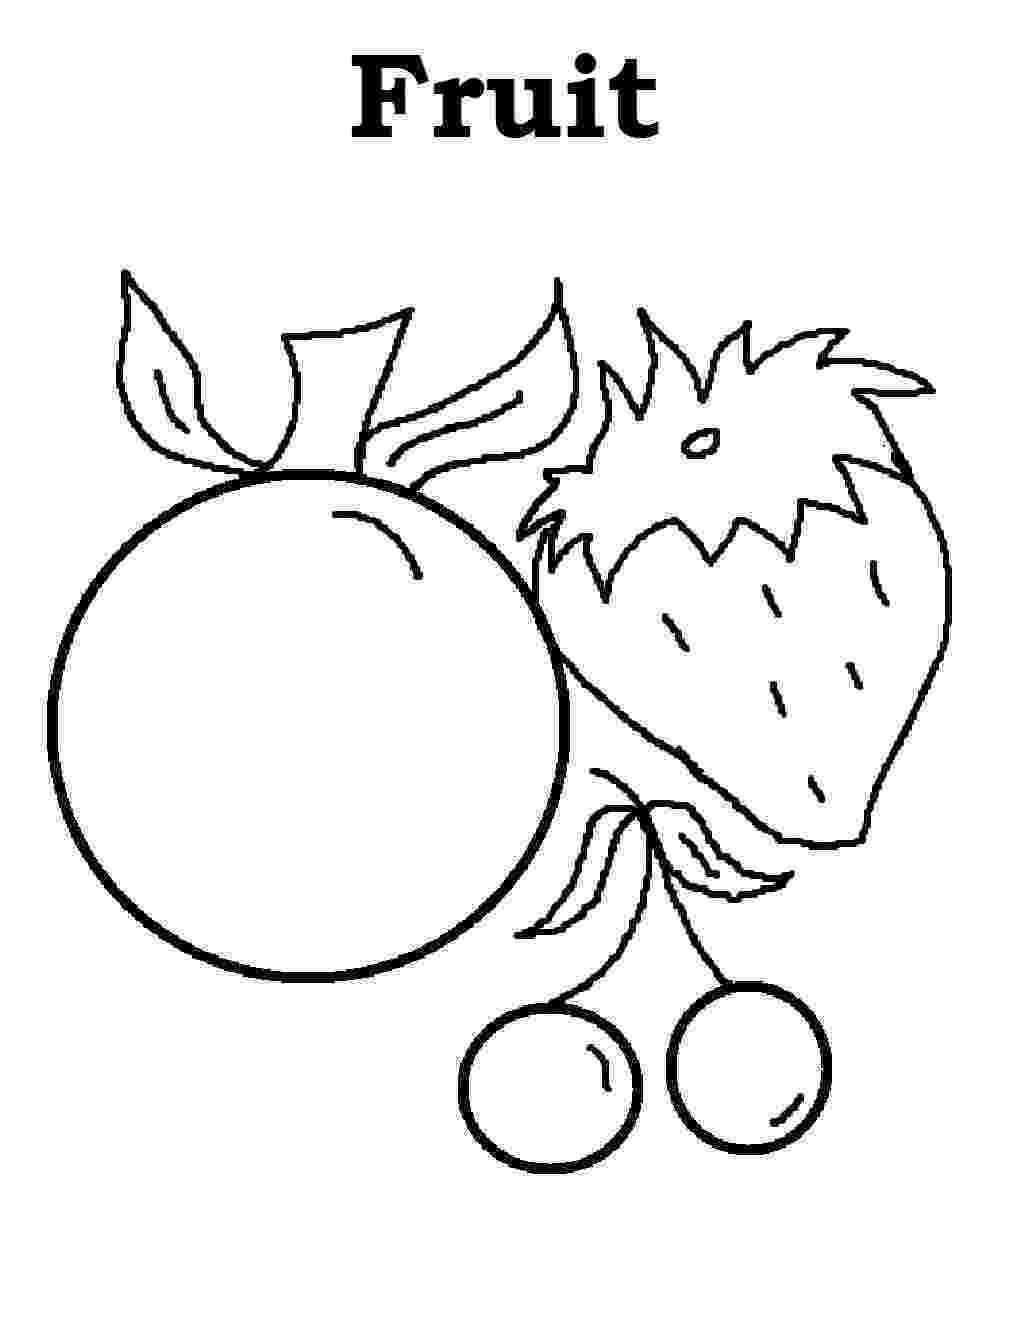 fruits coloring sheets free printable fruit coloring pages for kids sheets fruits coloring